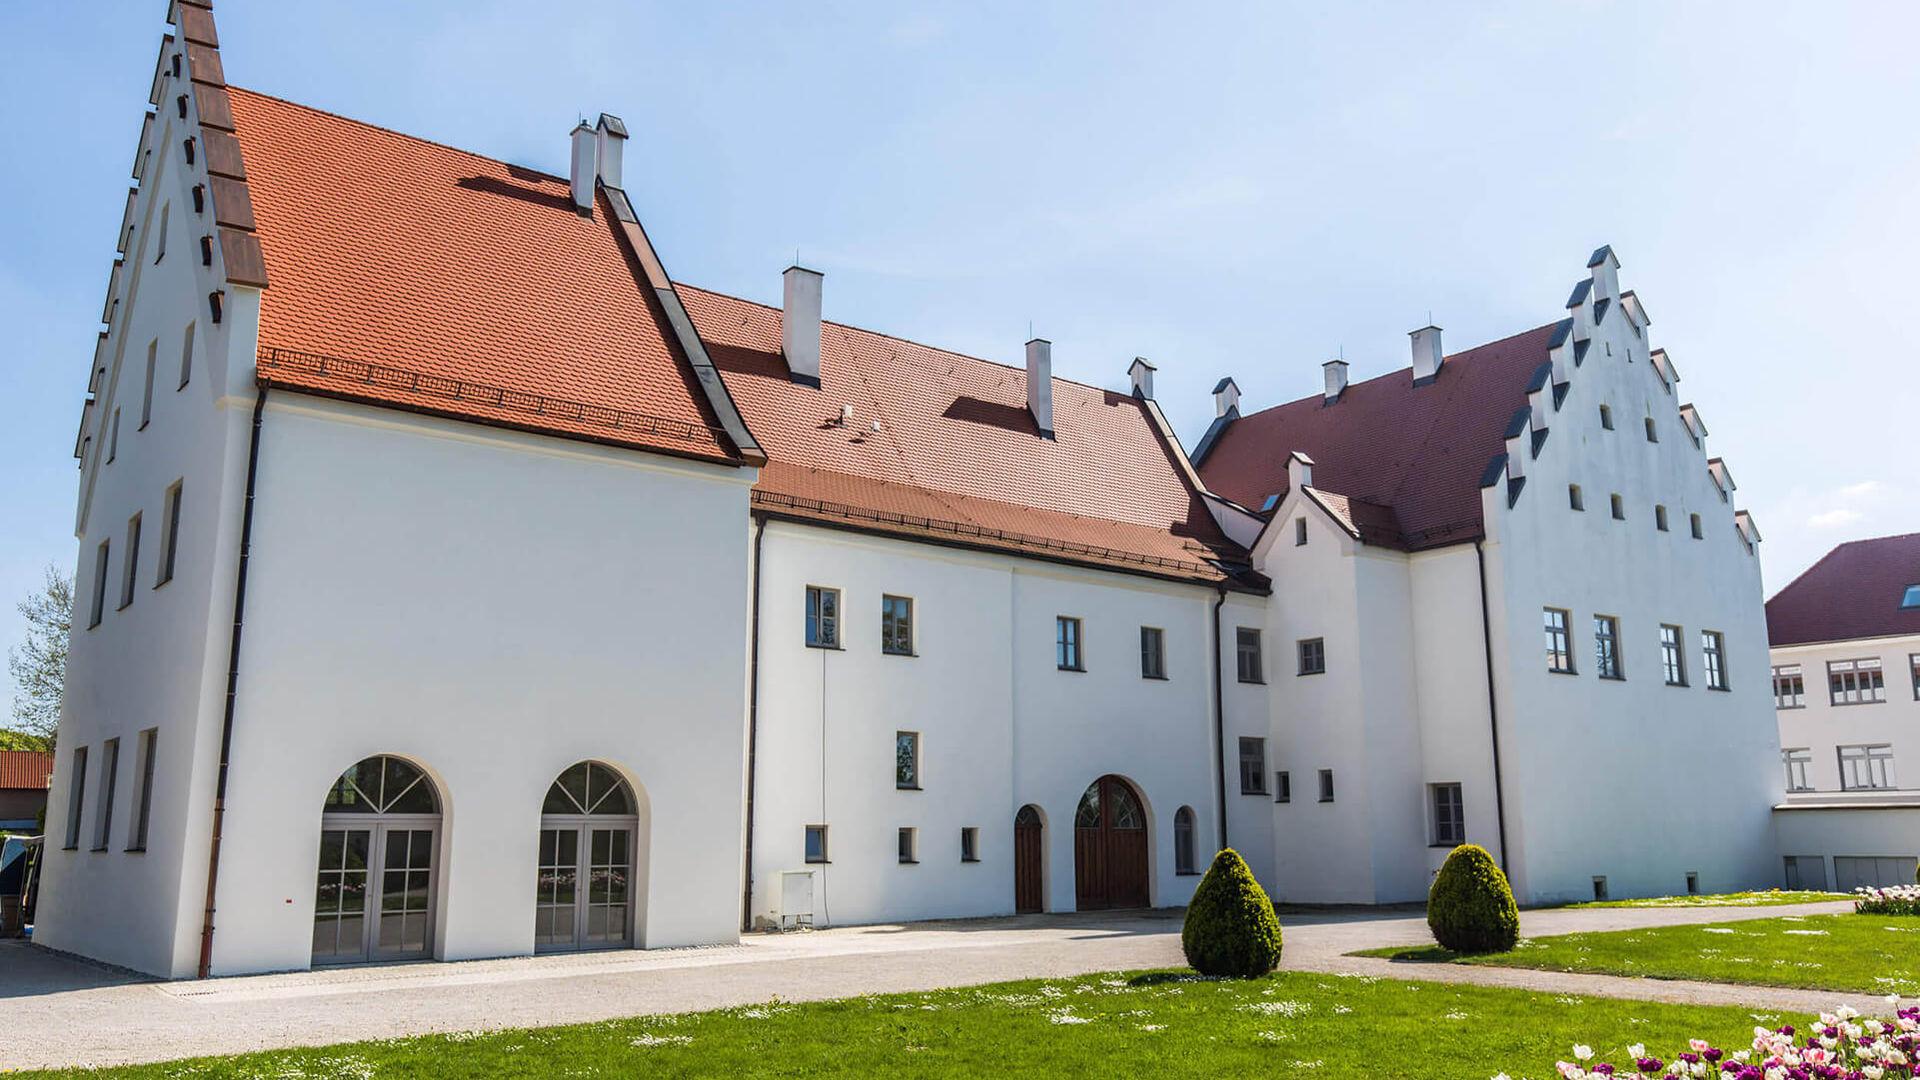 06-Schloss Rain 11y.jpg